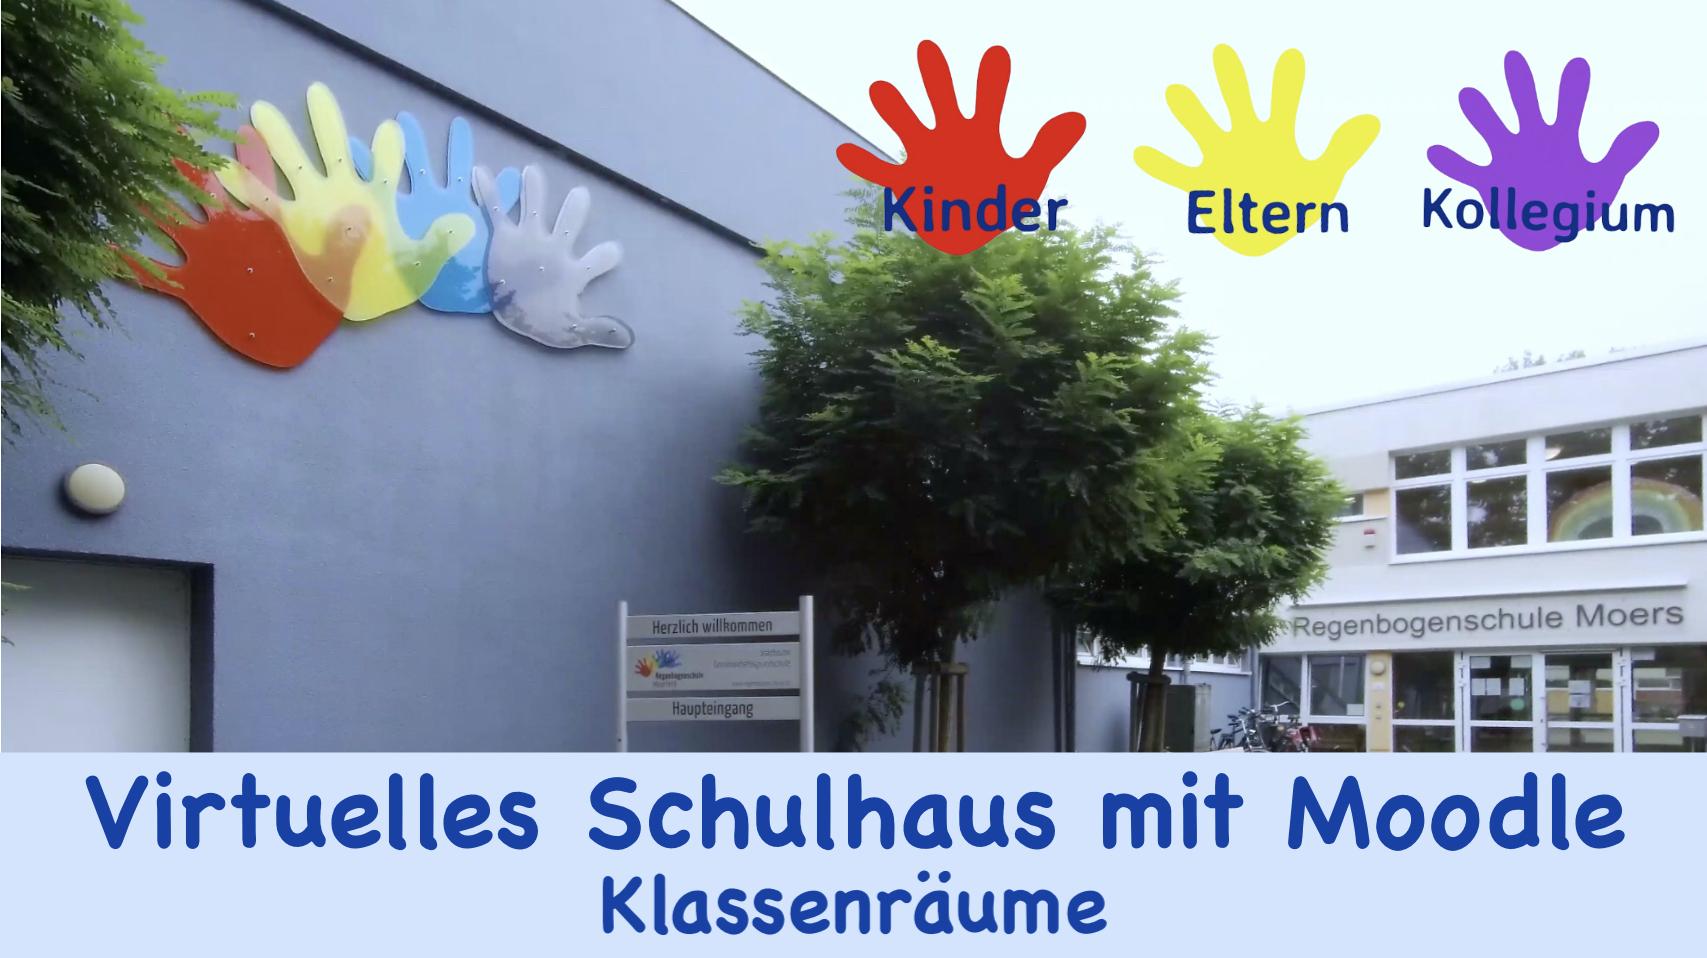 LINK: Virtuelles Schulhaus - Klassenräume